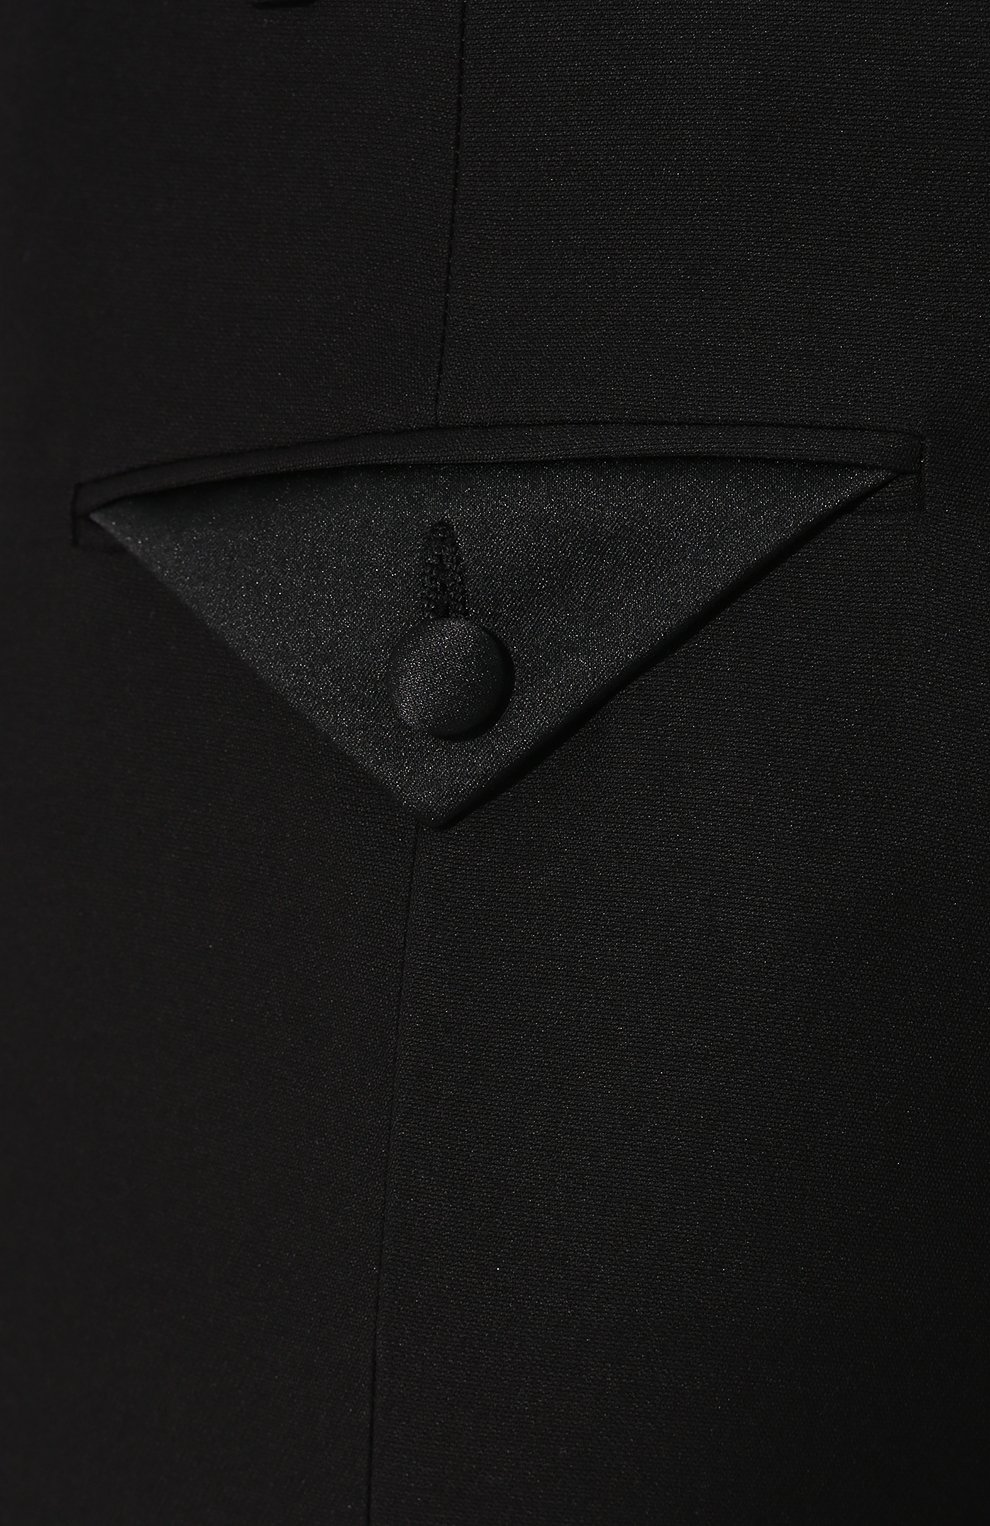 Брюки из смеси шерсти и шелка Valentino черные | Фото №5